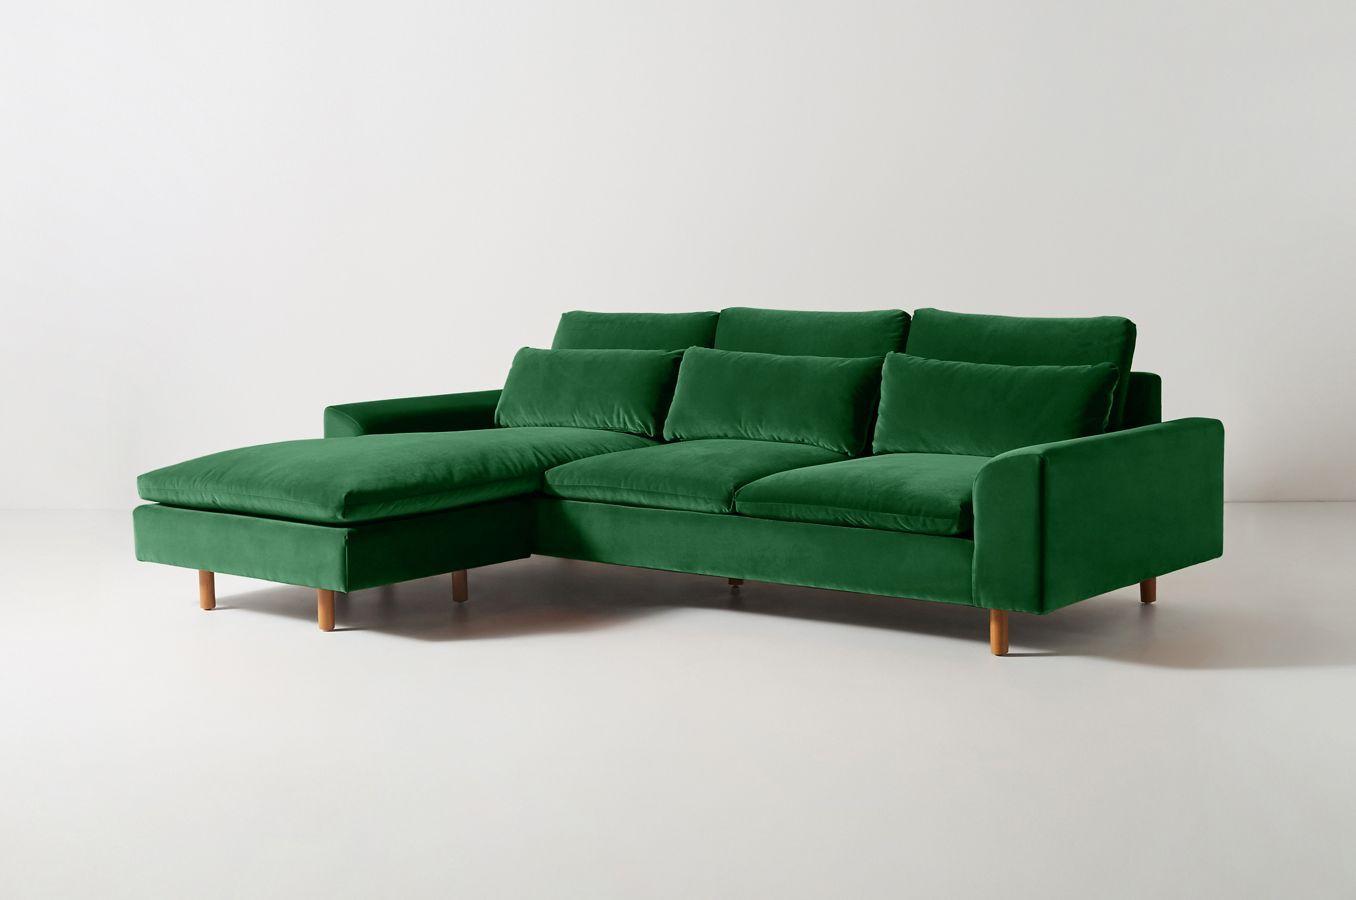 Admirable Mirren Reversible Chaise Sectional Living Room In 2019 Creativecarmelina Interior Chair Design Creativecarmelinacom